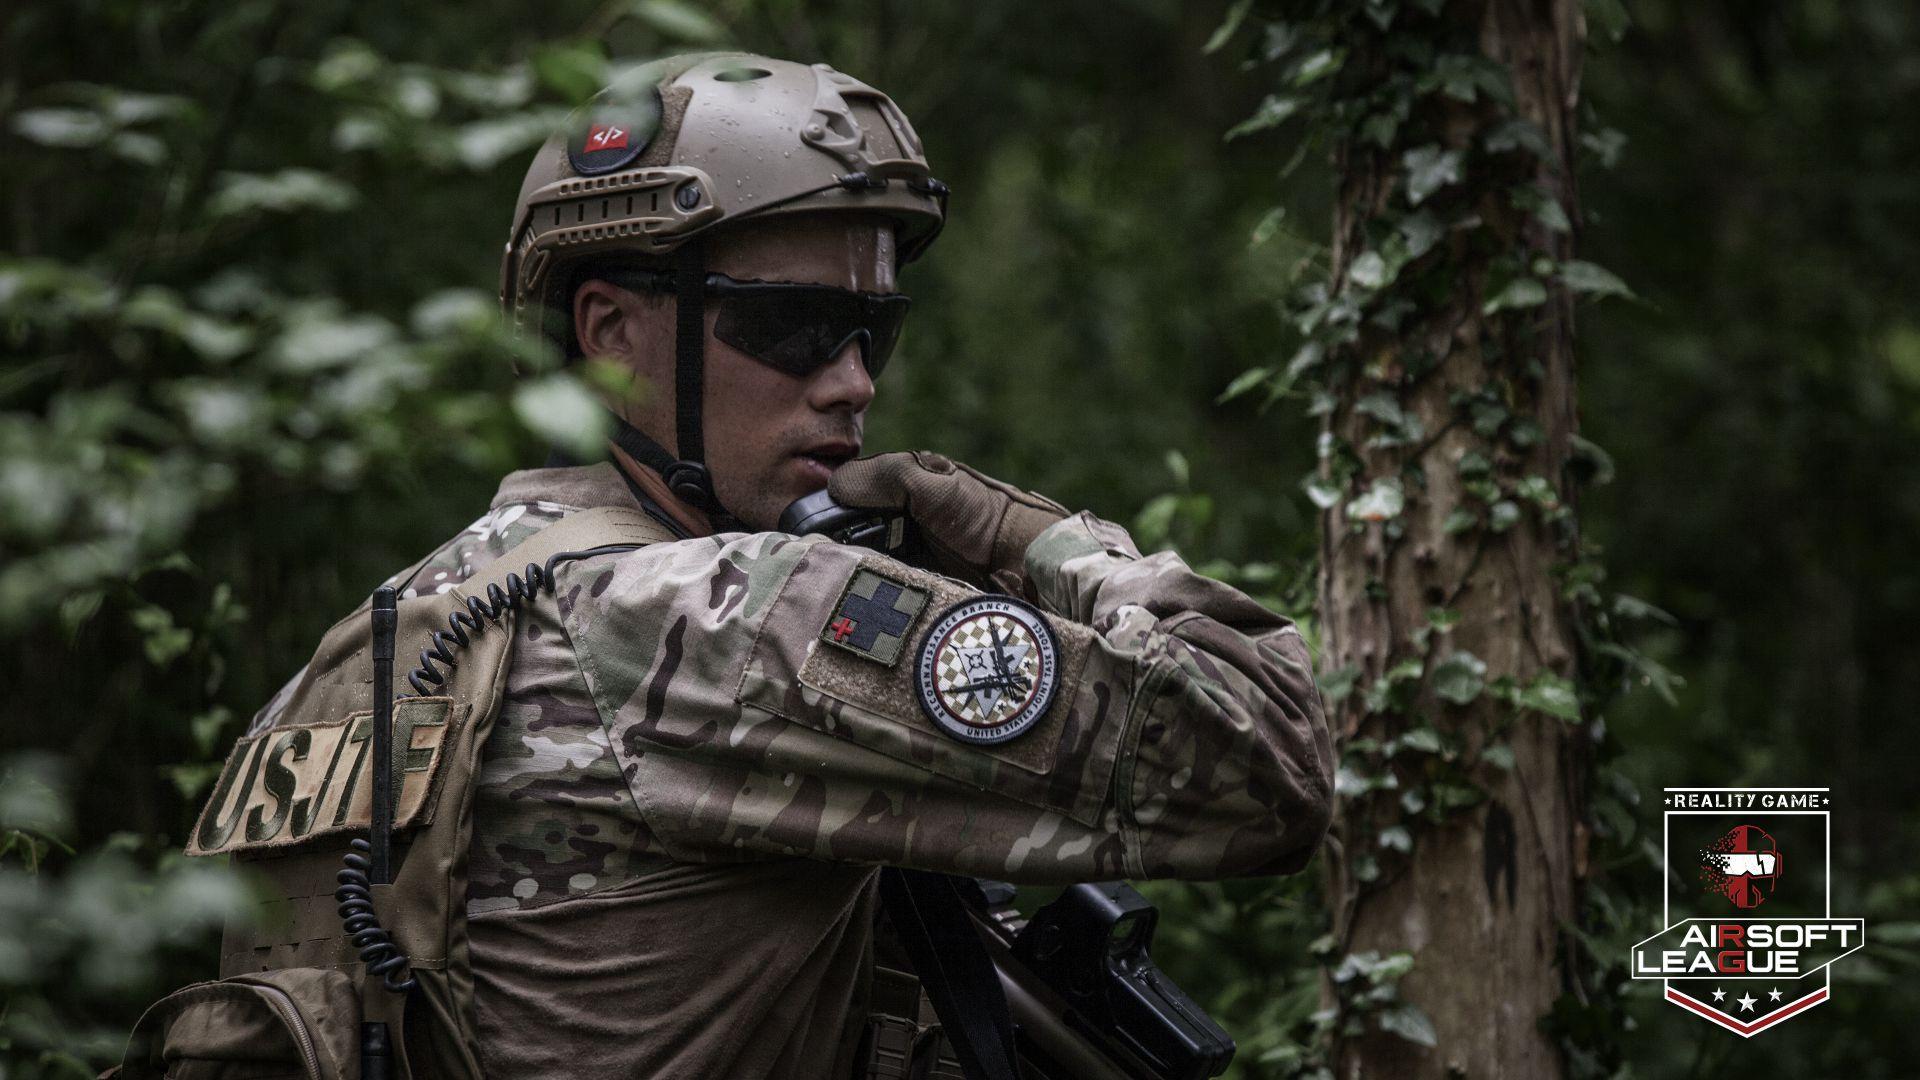 Police militaire - Soldat